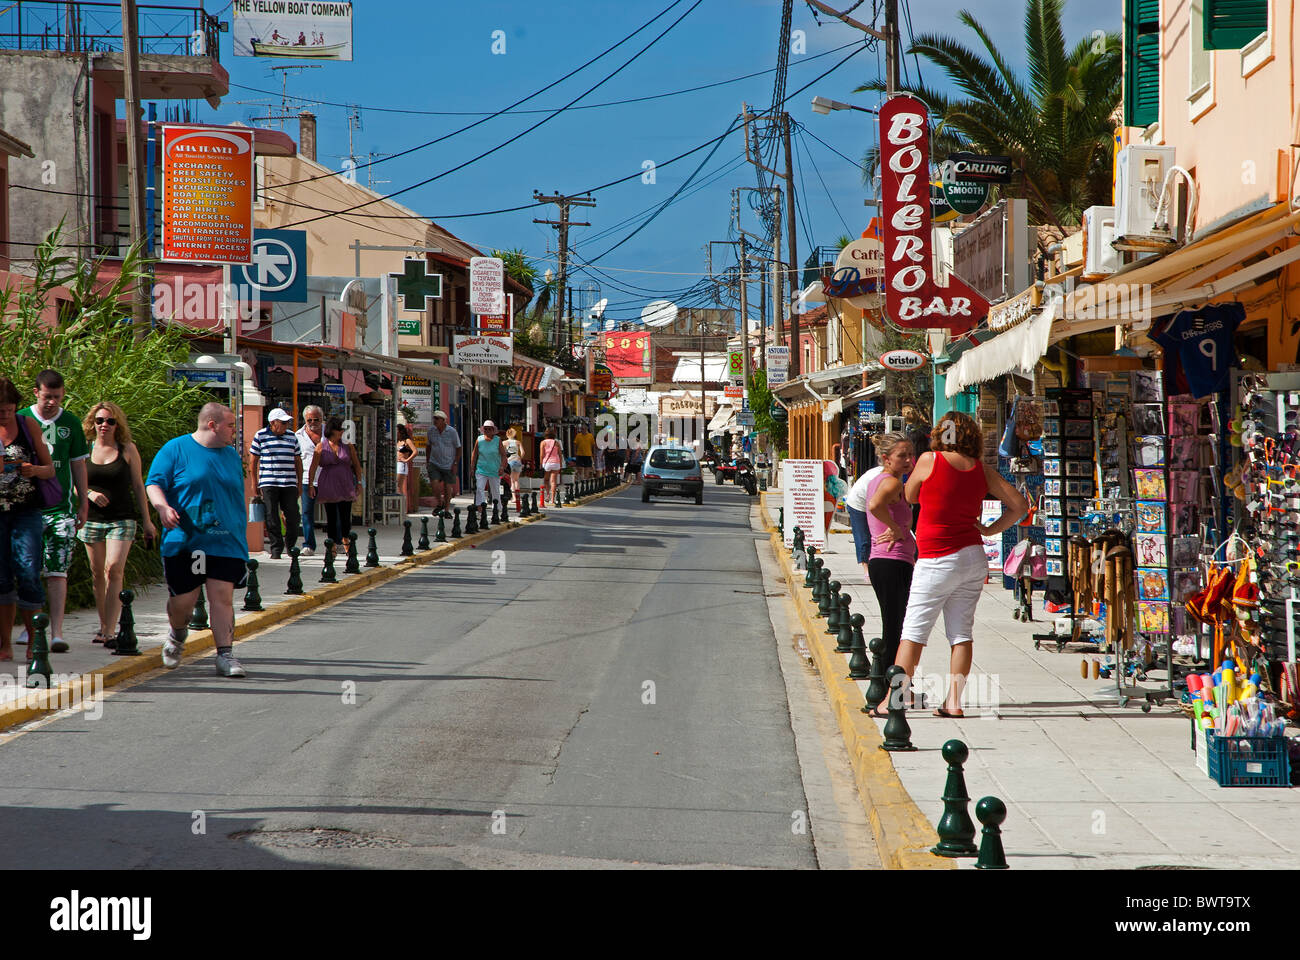 Sidari main street, Corfu Ionian Islands Greece. - Stock Image